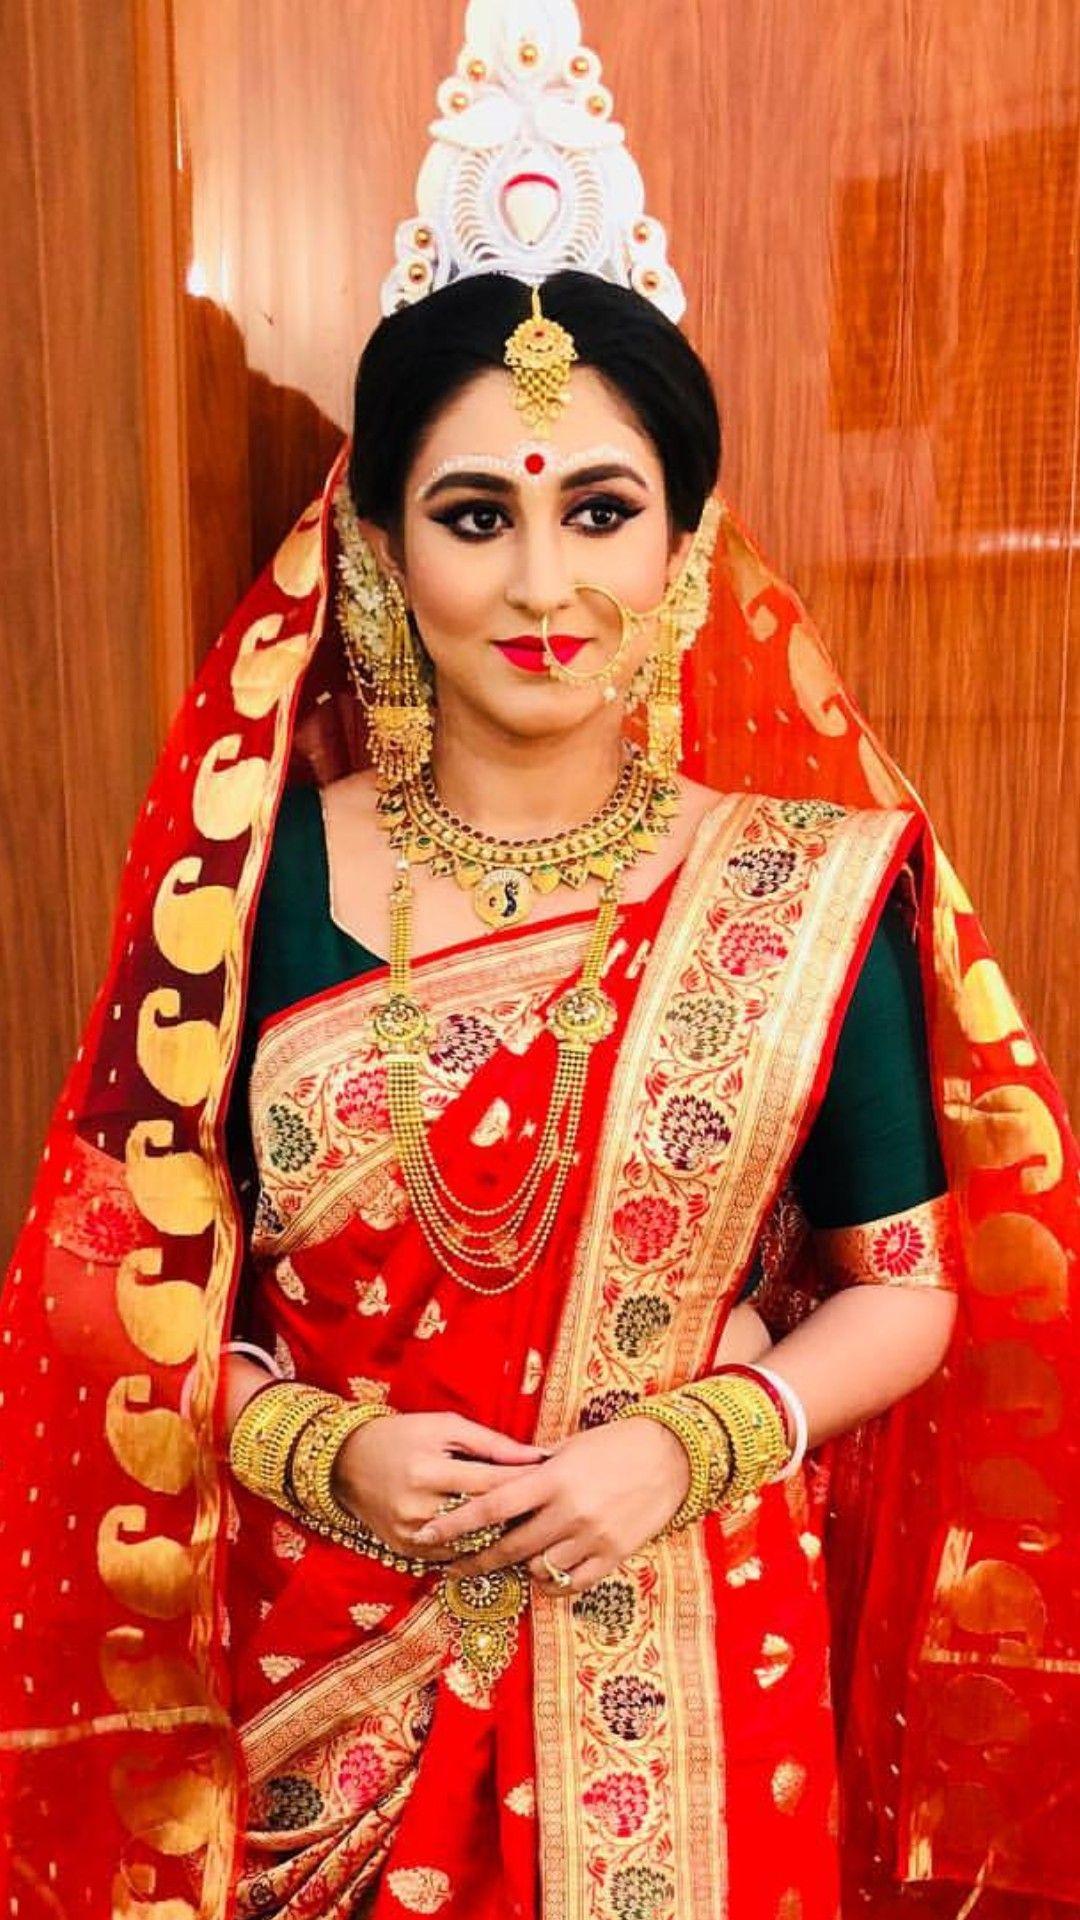 mãđhű for more pics follow | bengali brides in 2019 | radha